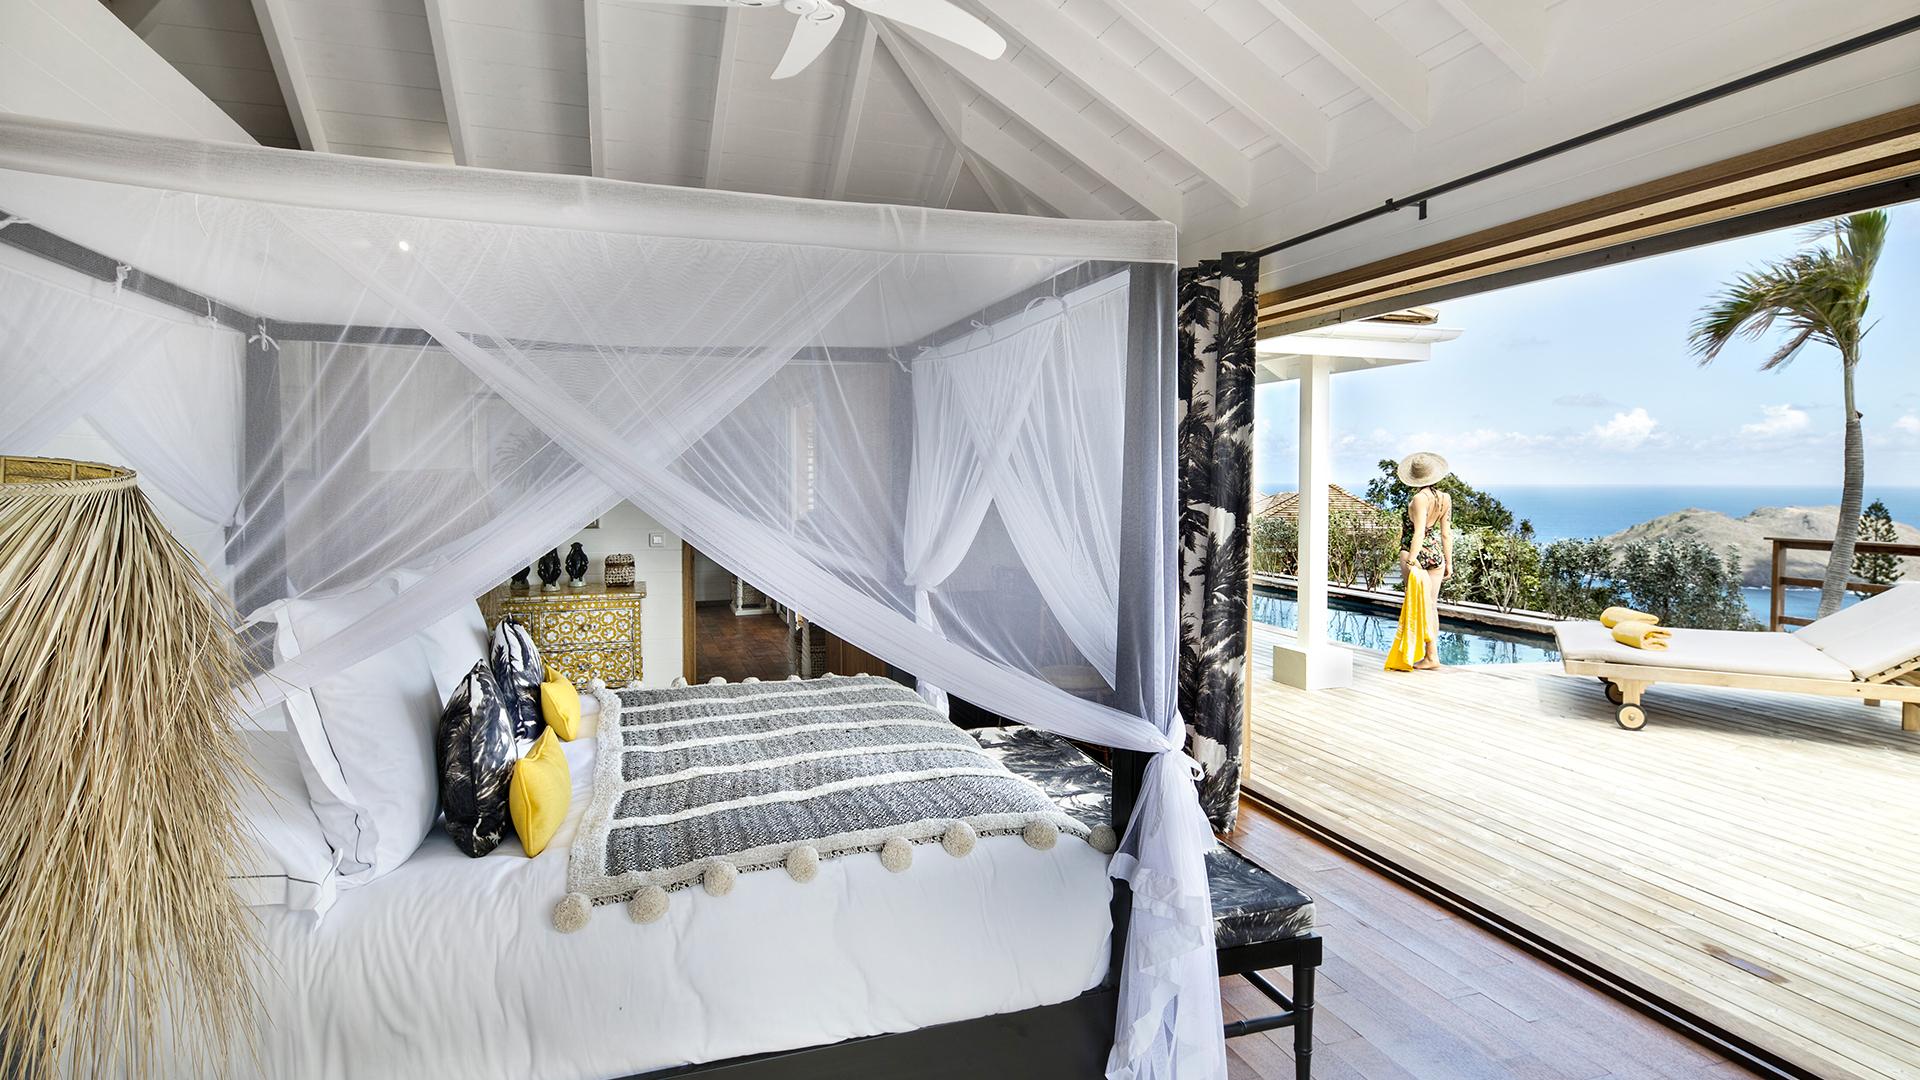 Chambres et villas - Villa Marie Saint-Barth